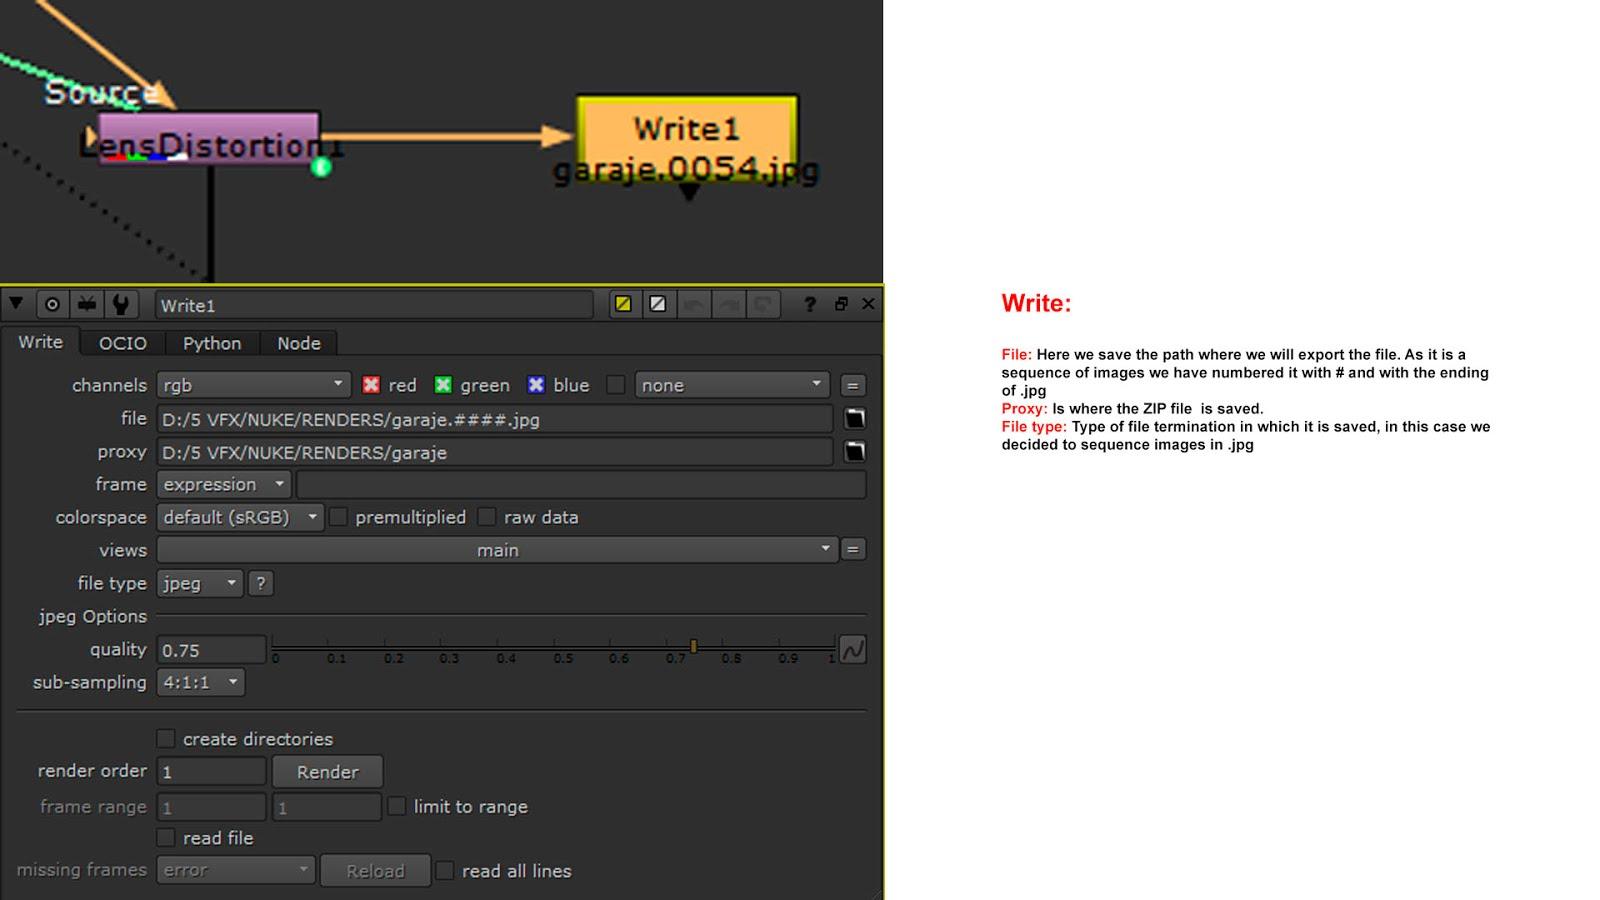 KIVA011: VFX NUKE